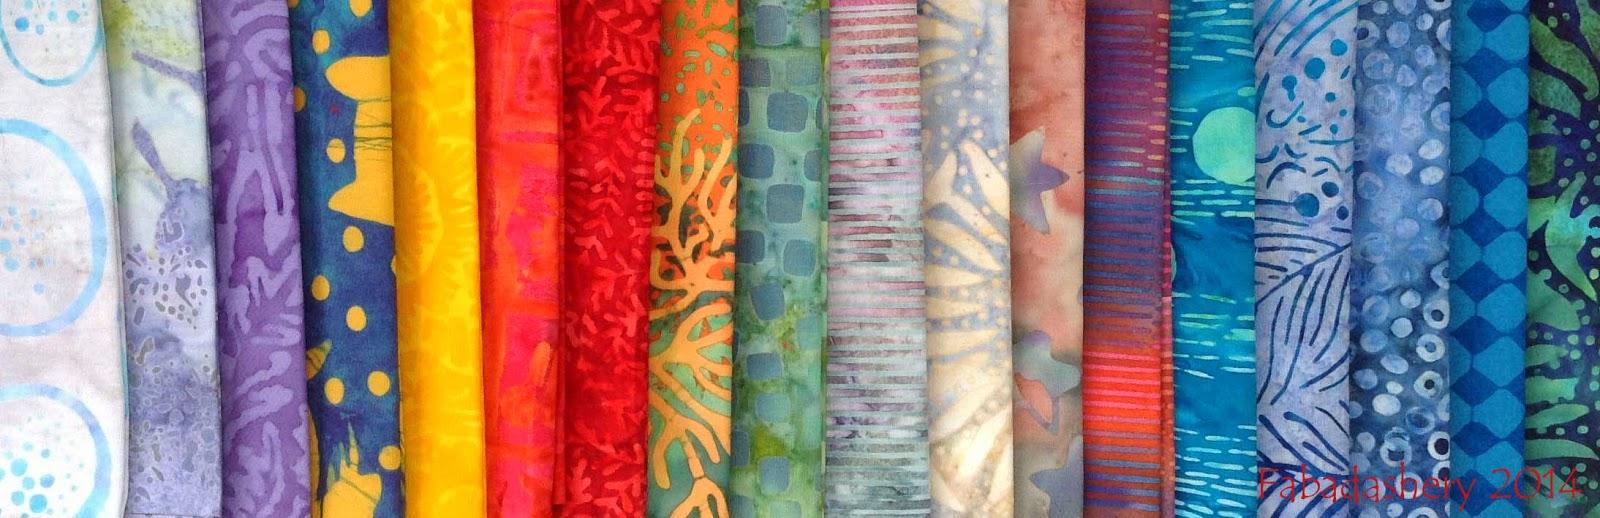 Giveaway Prize - 18 FQs of Batik Fabric